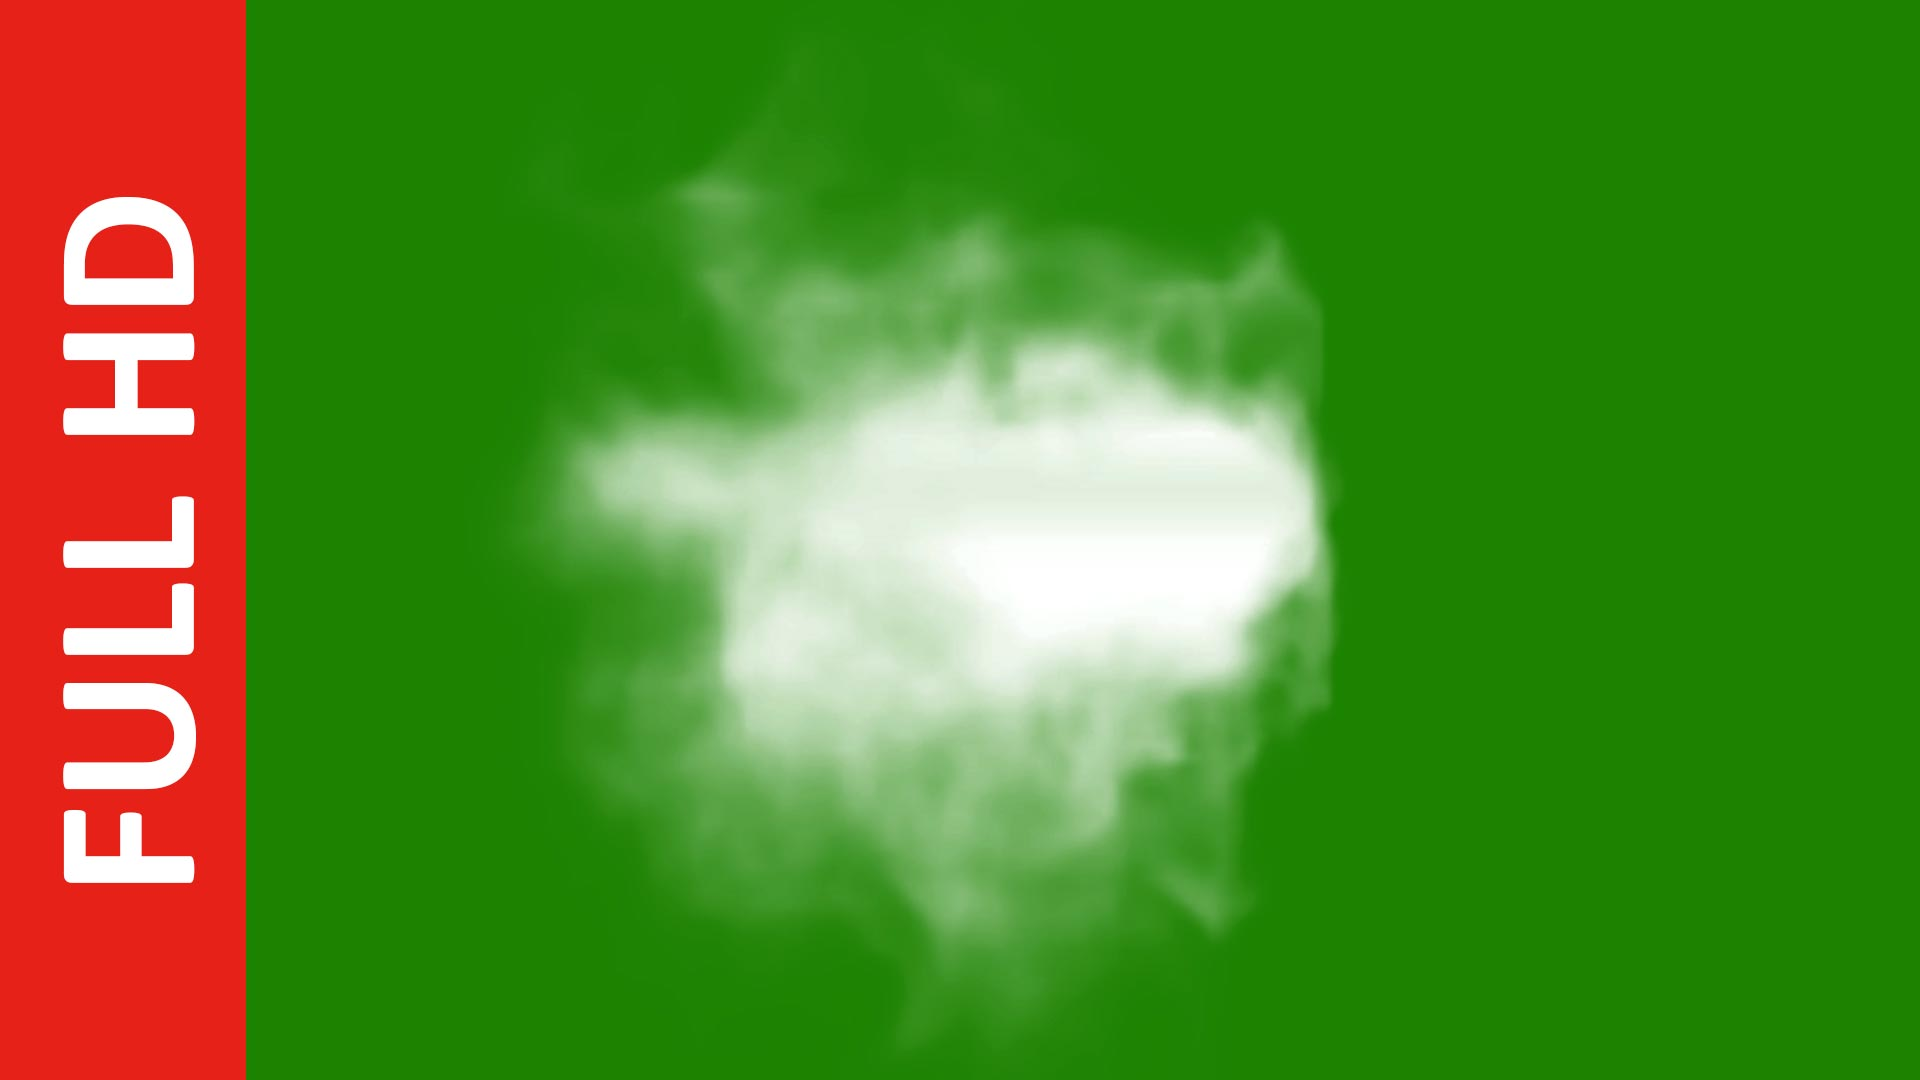 Center Smoke Green screen Effect HD Video Free Download | All Design